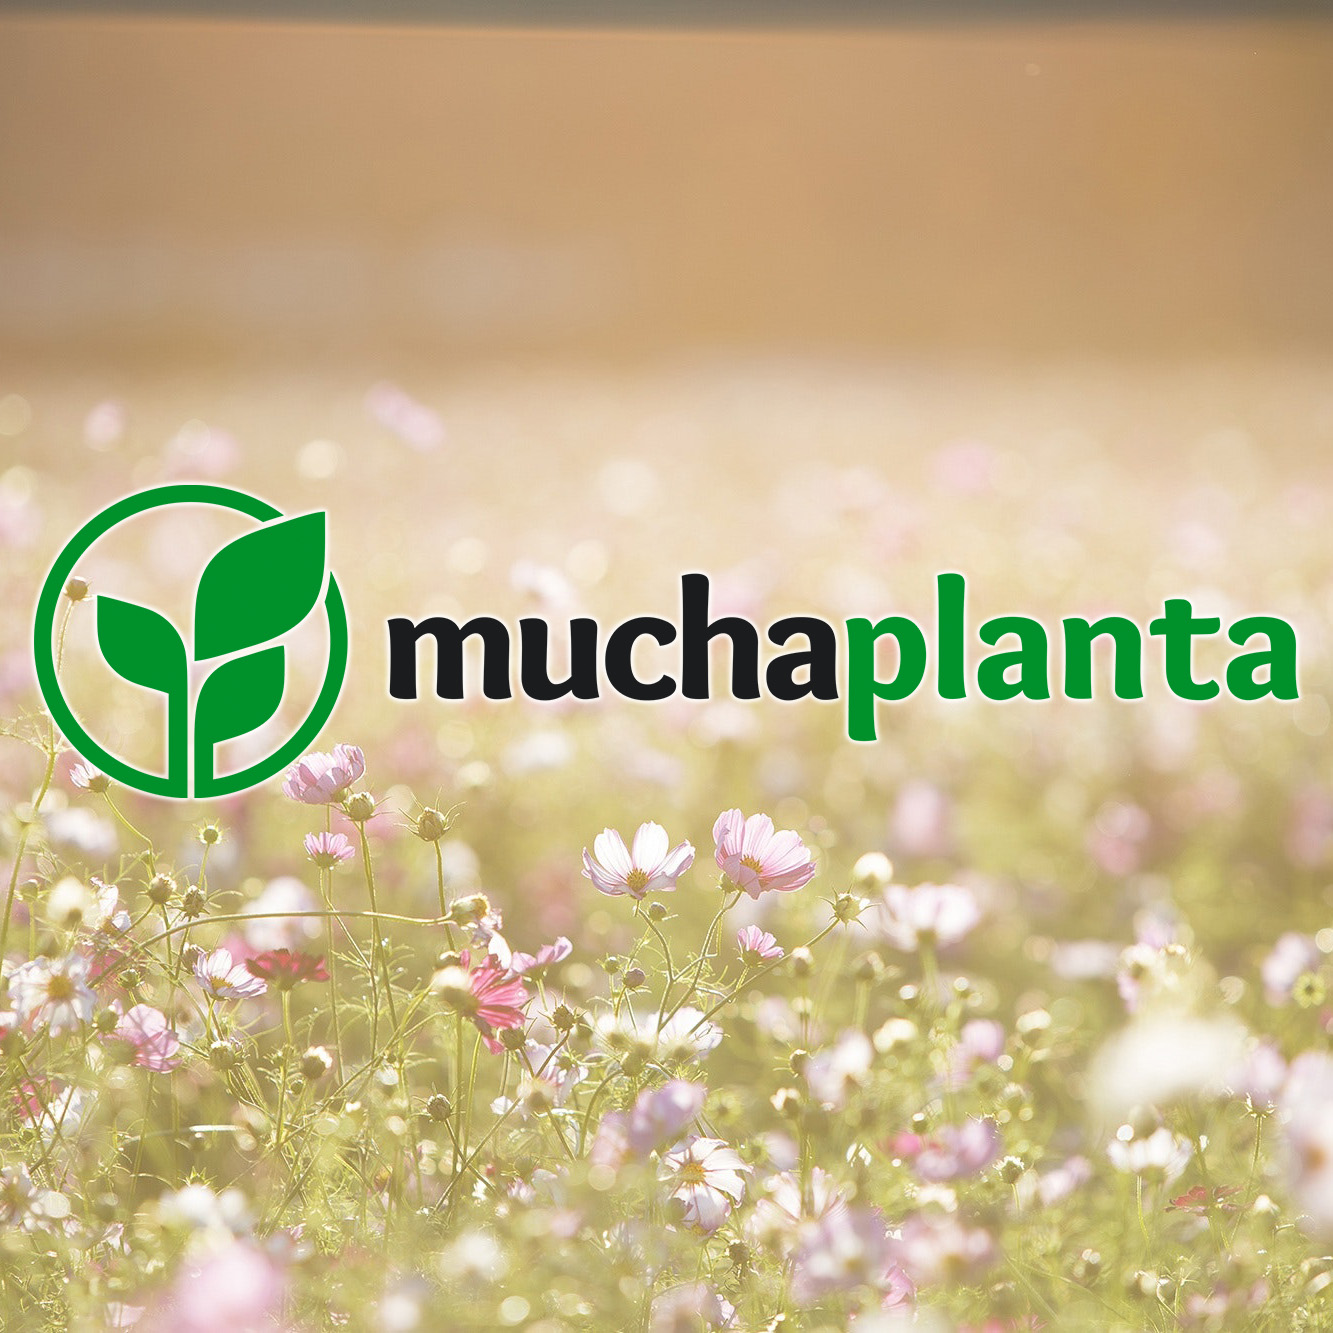 MuchaPlanta